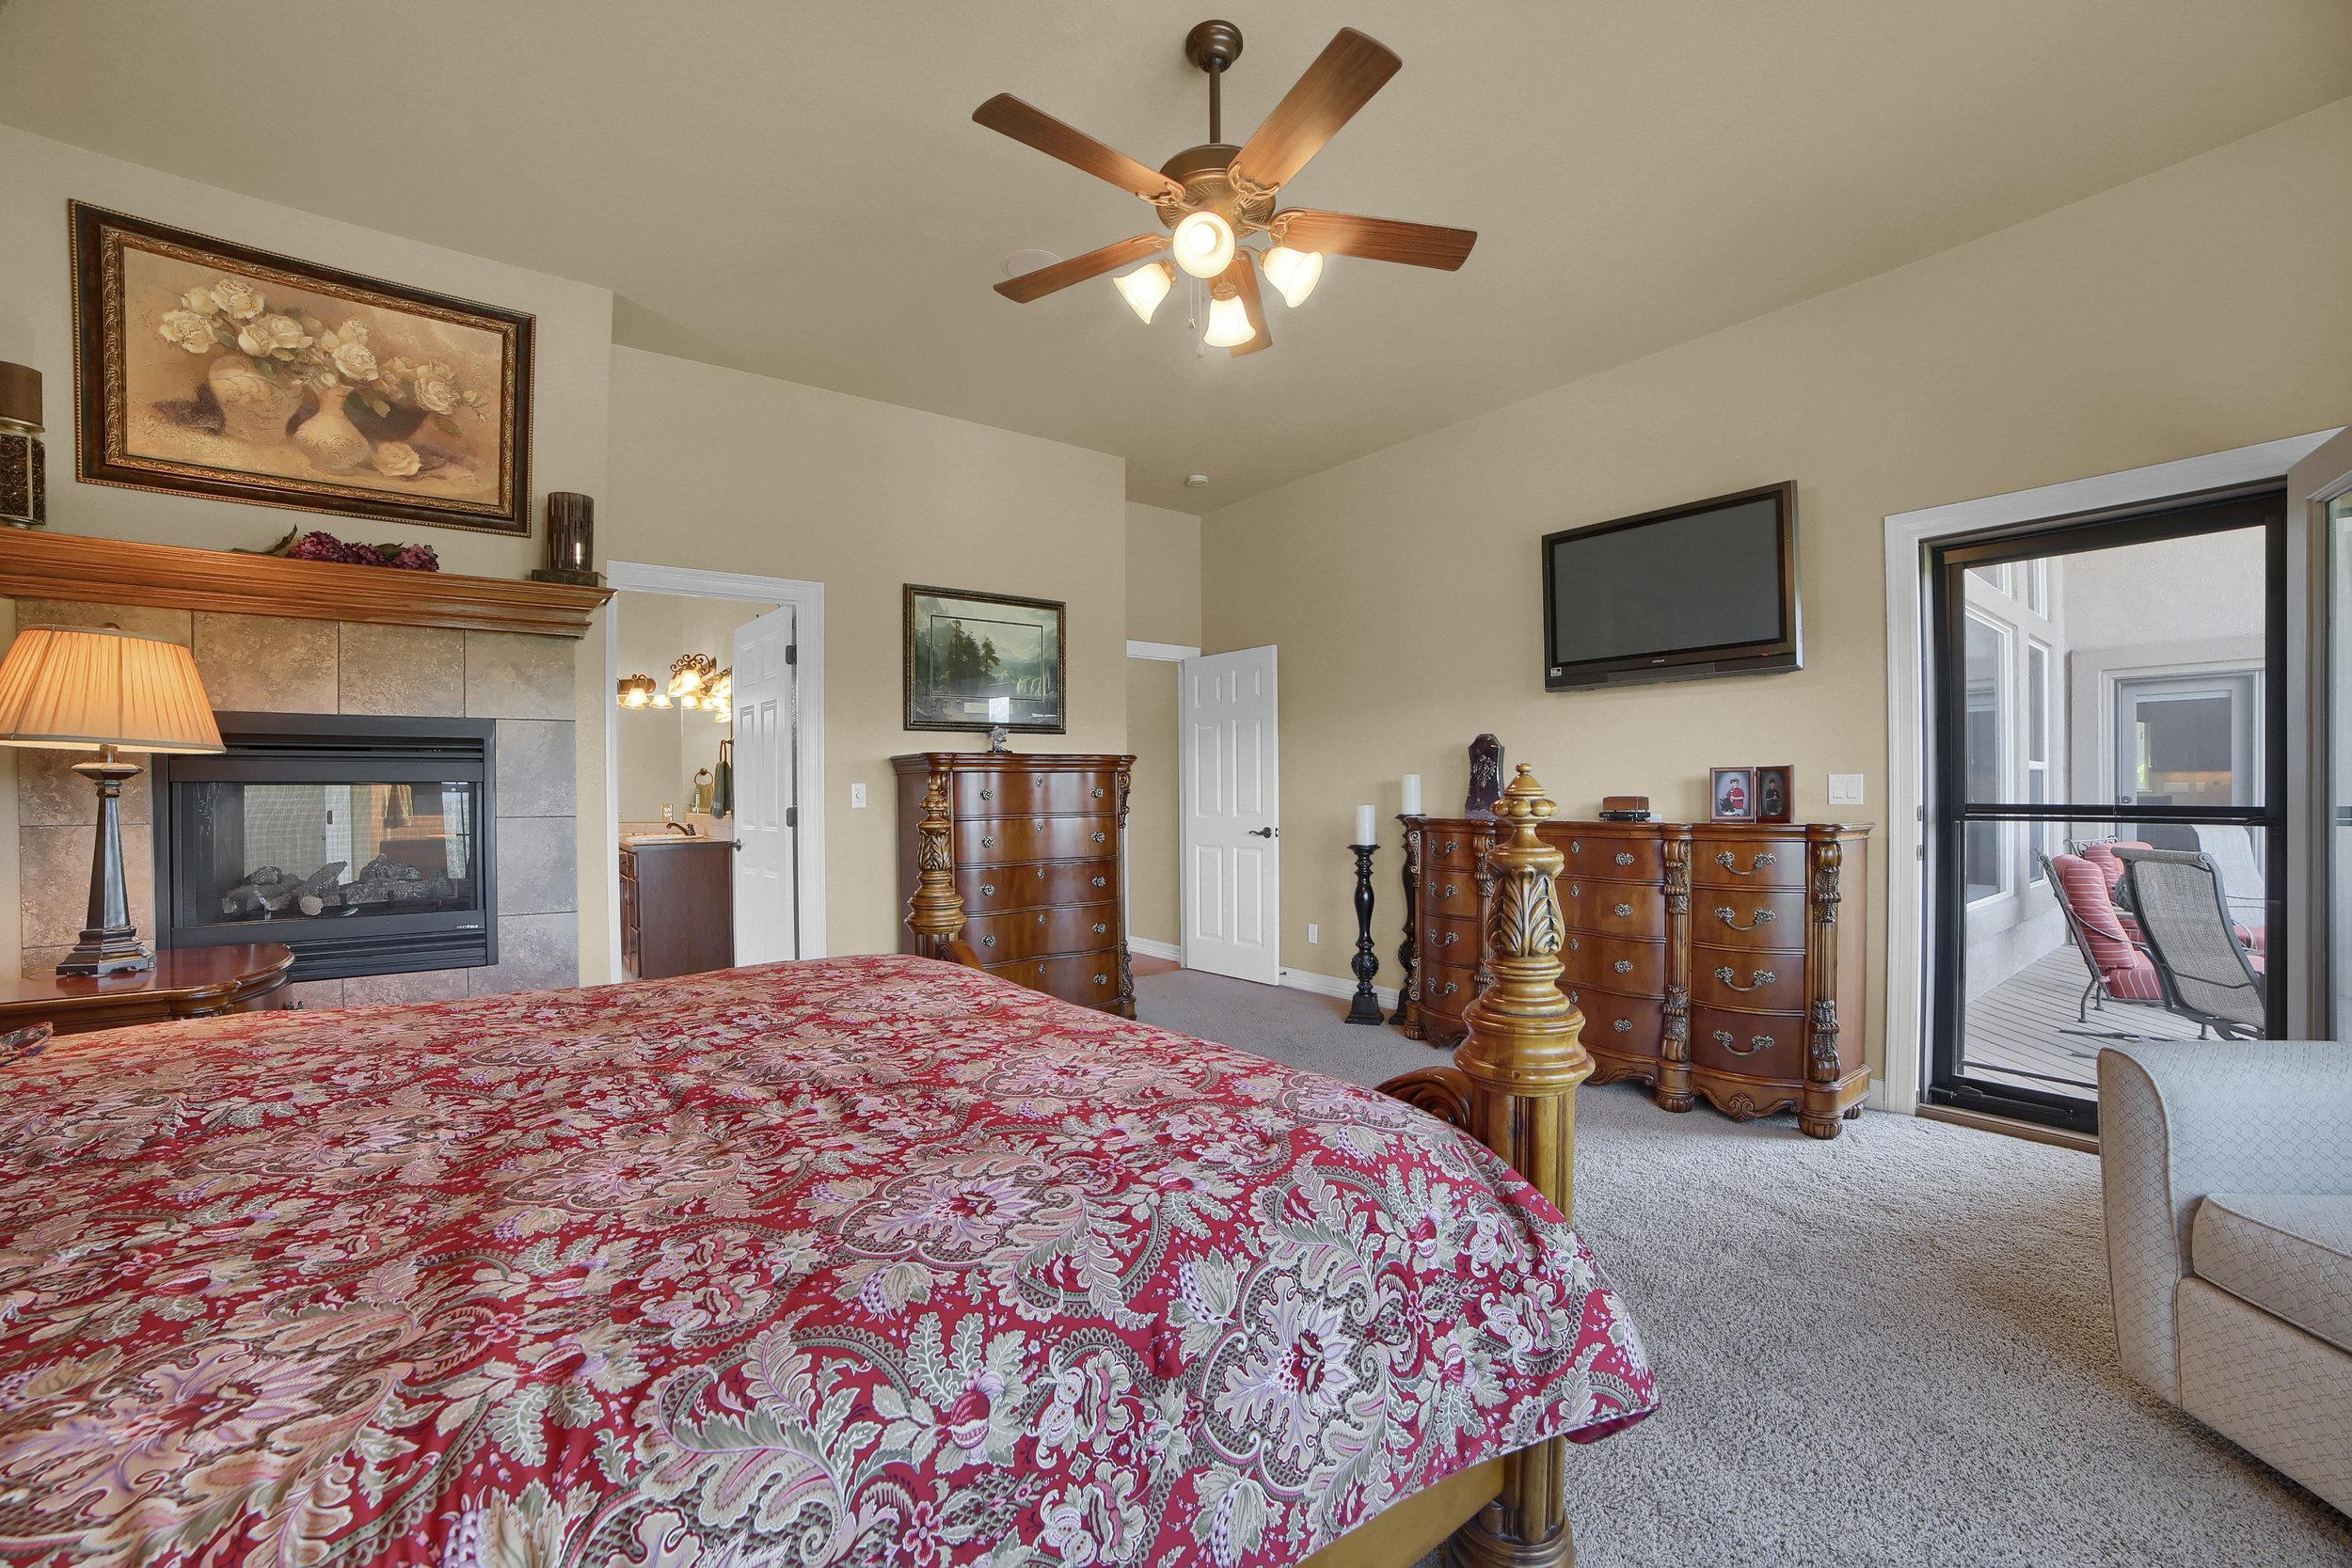 12496 Creekhurst Dr Colorado-print-043-015-Bedroom-3648x2432-300dpi.jpg